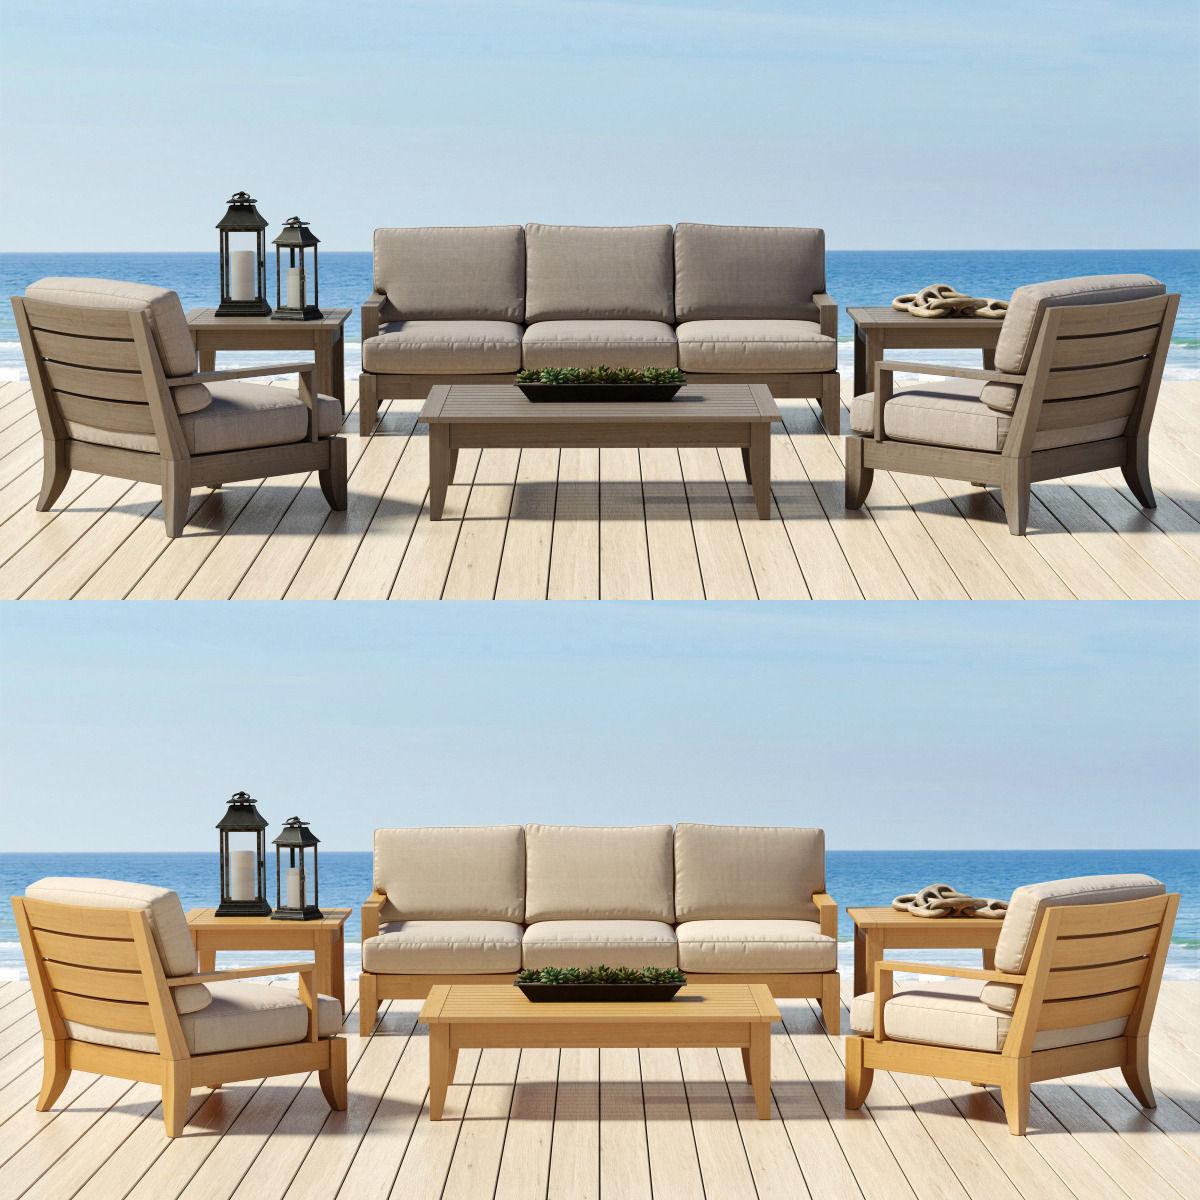 Haywards Patio Furniture Santa Barbara. Santa Barbara Patio Furniture    Restoration Hardware Collection 3d Model